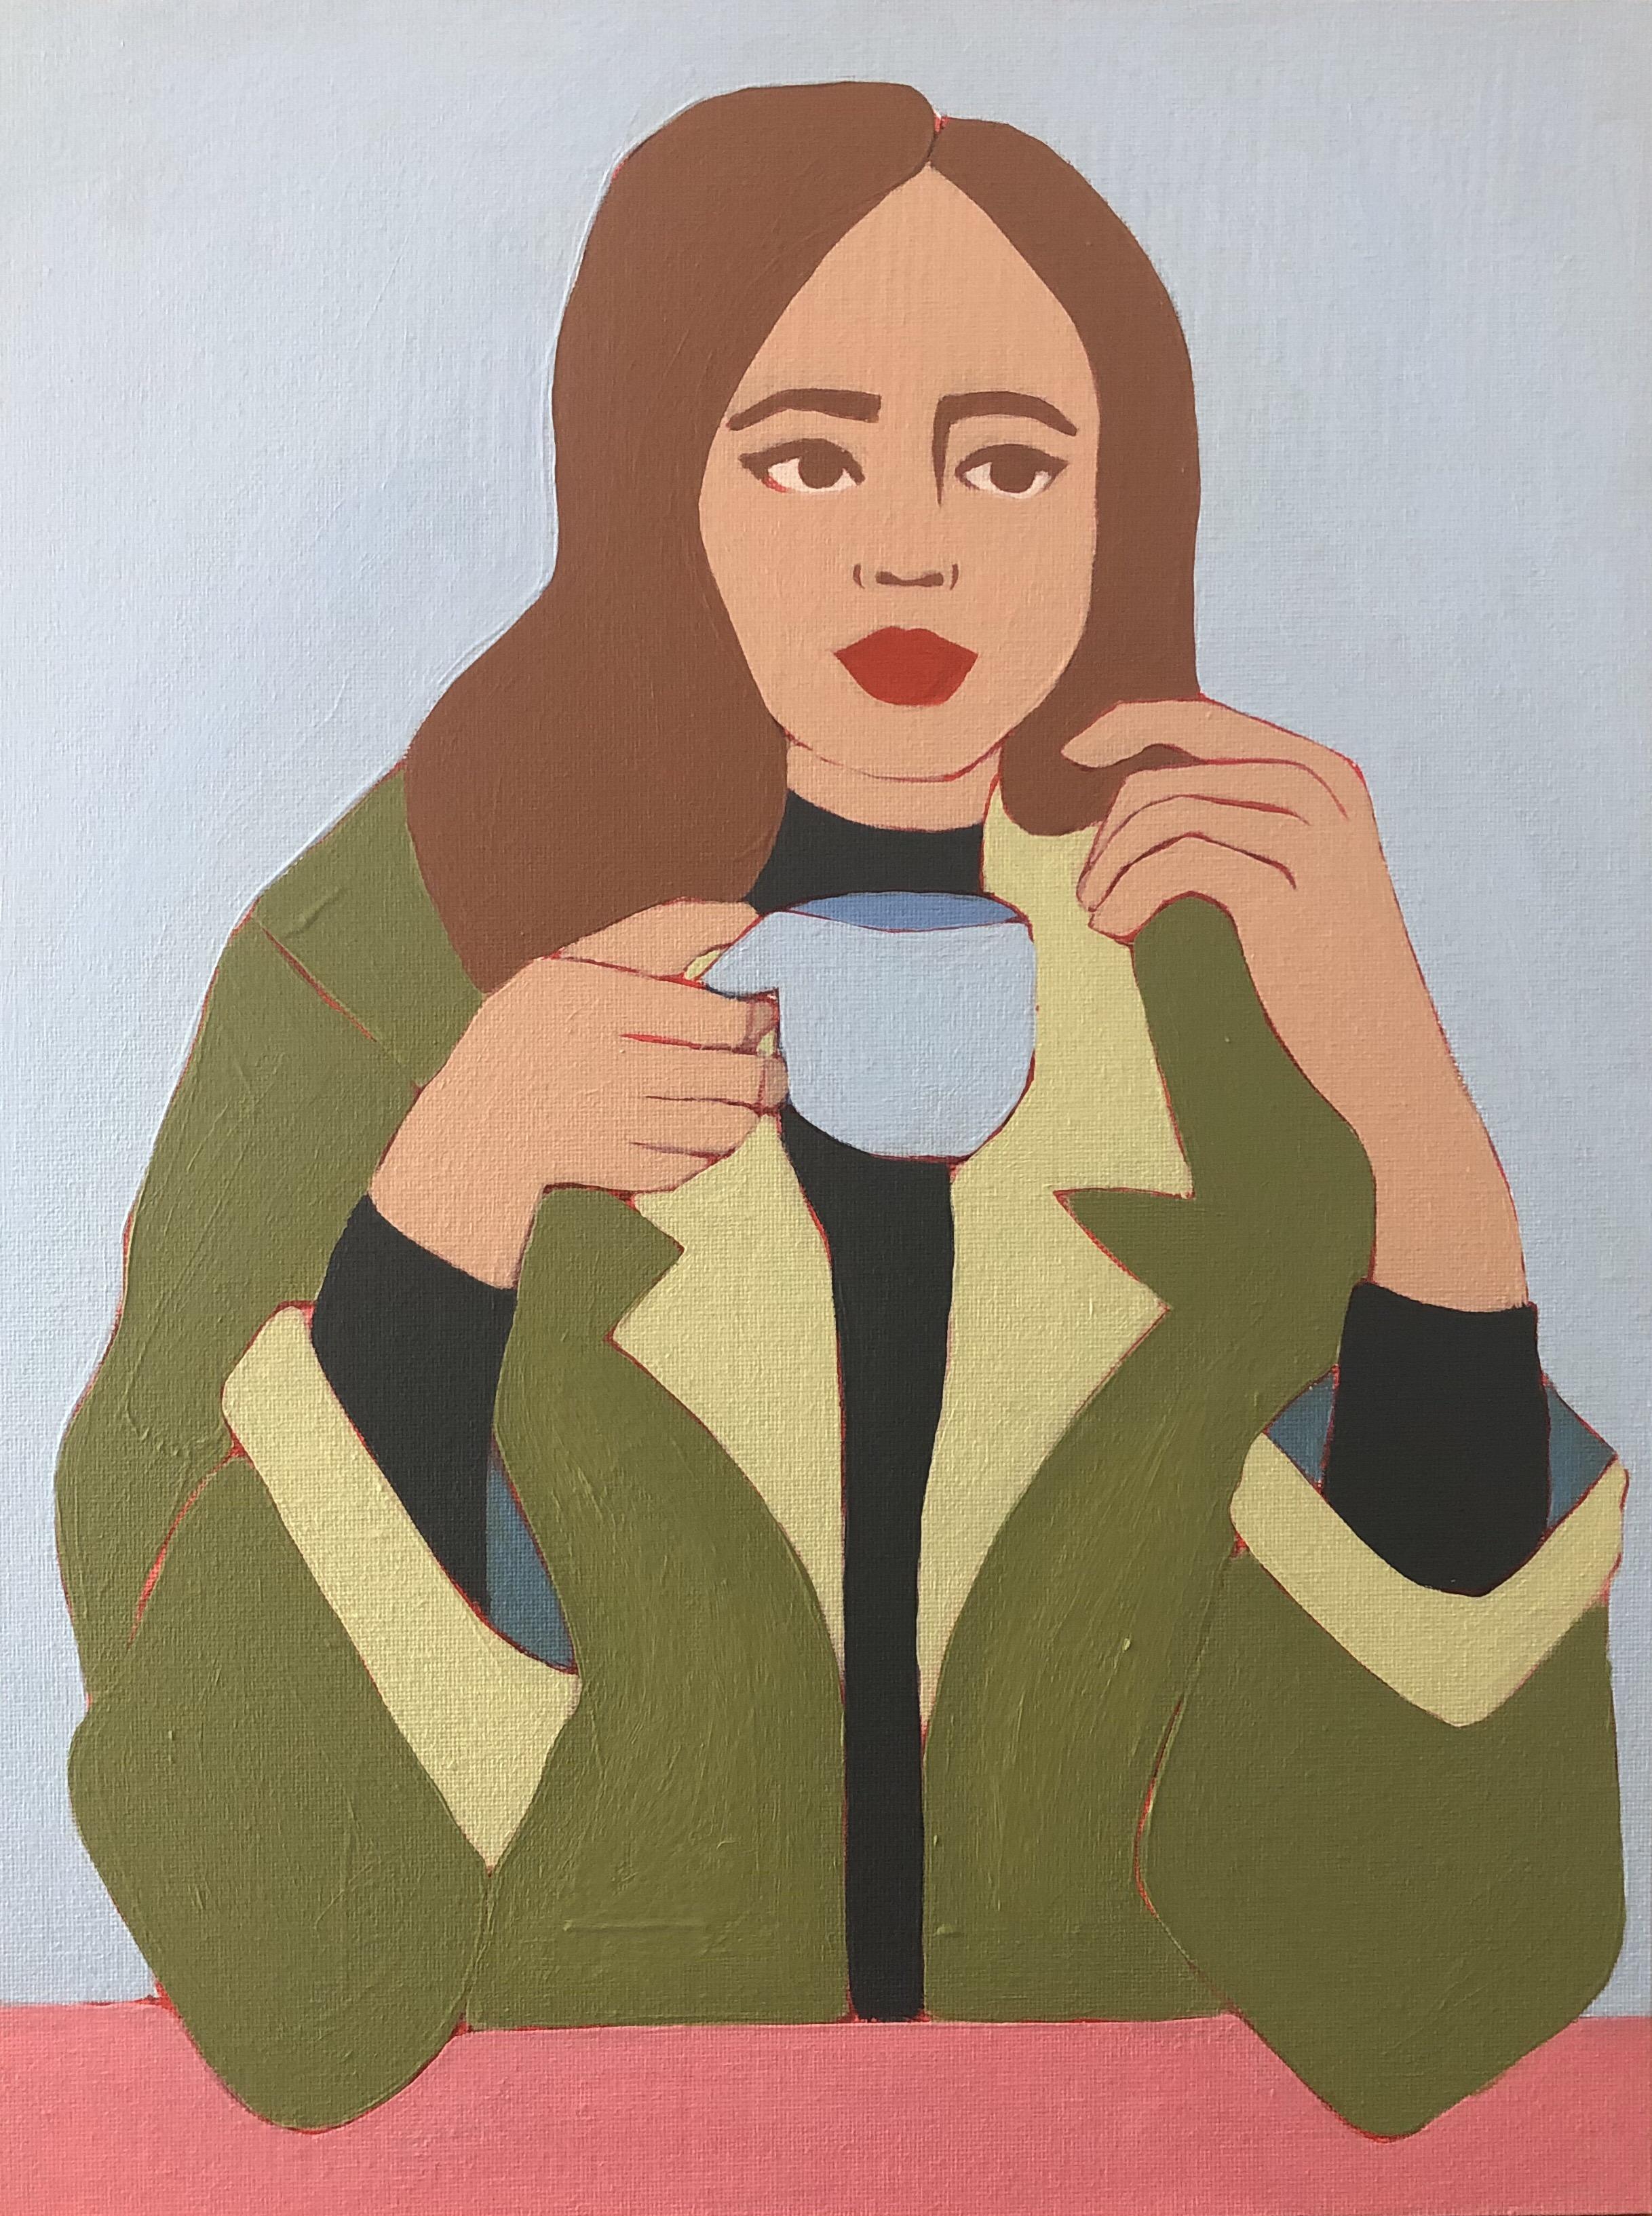 Espresso break